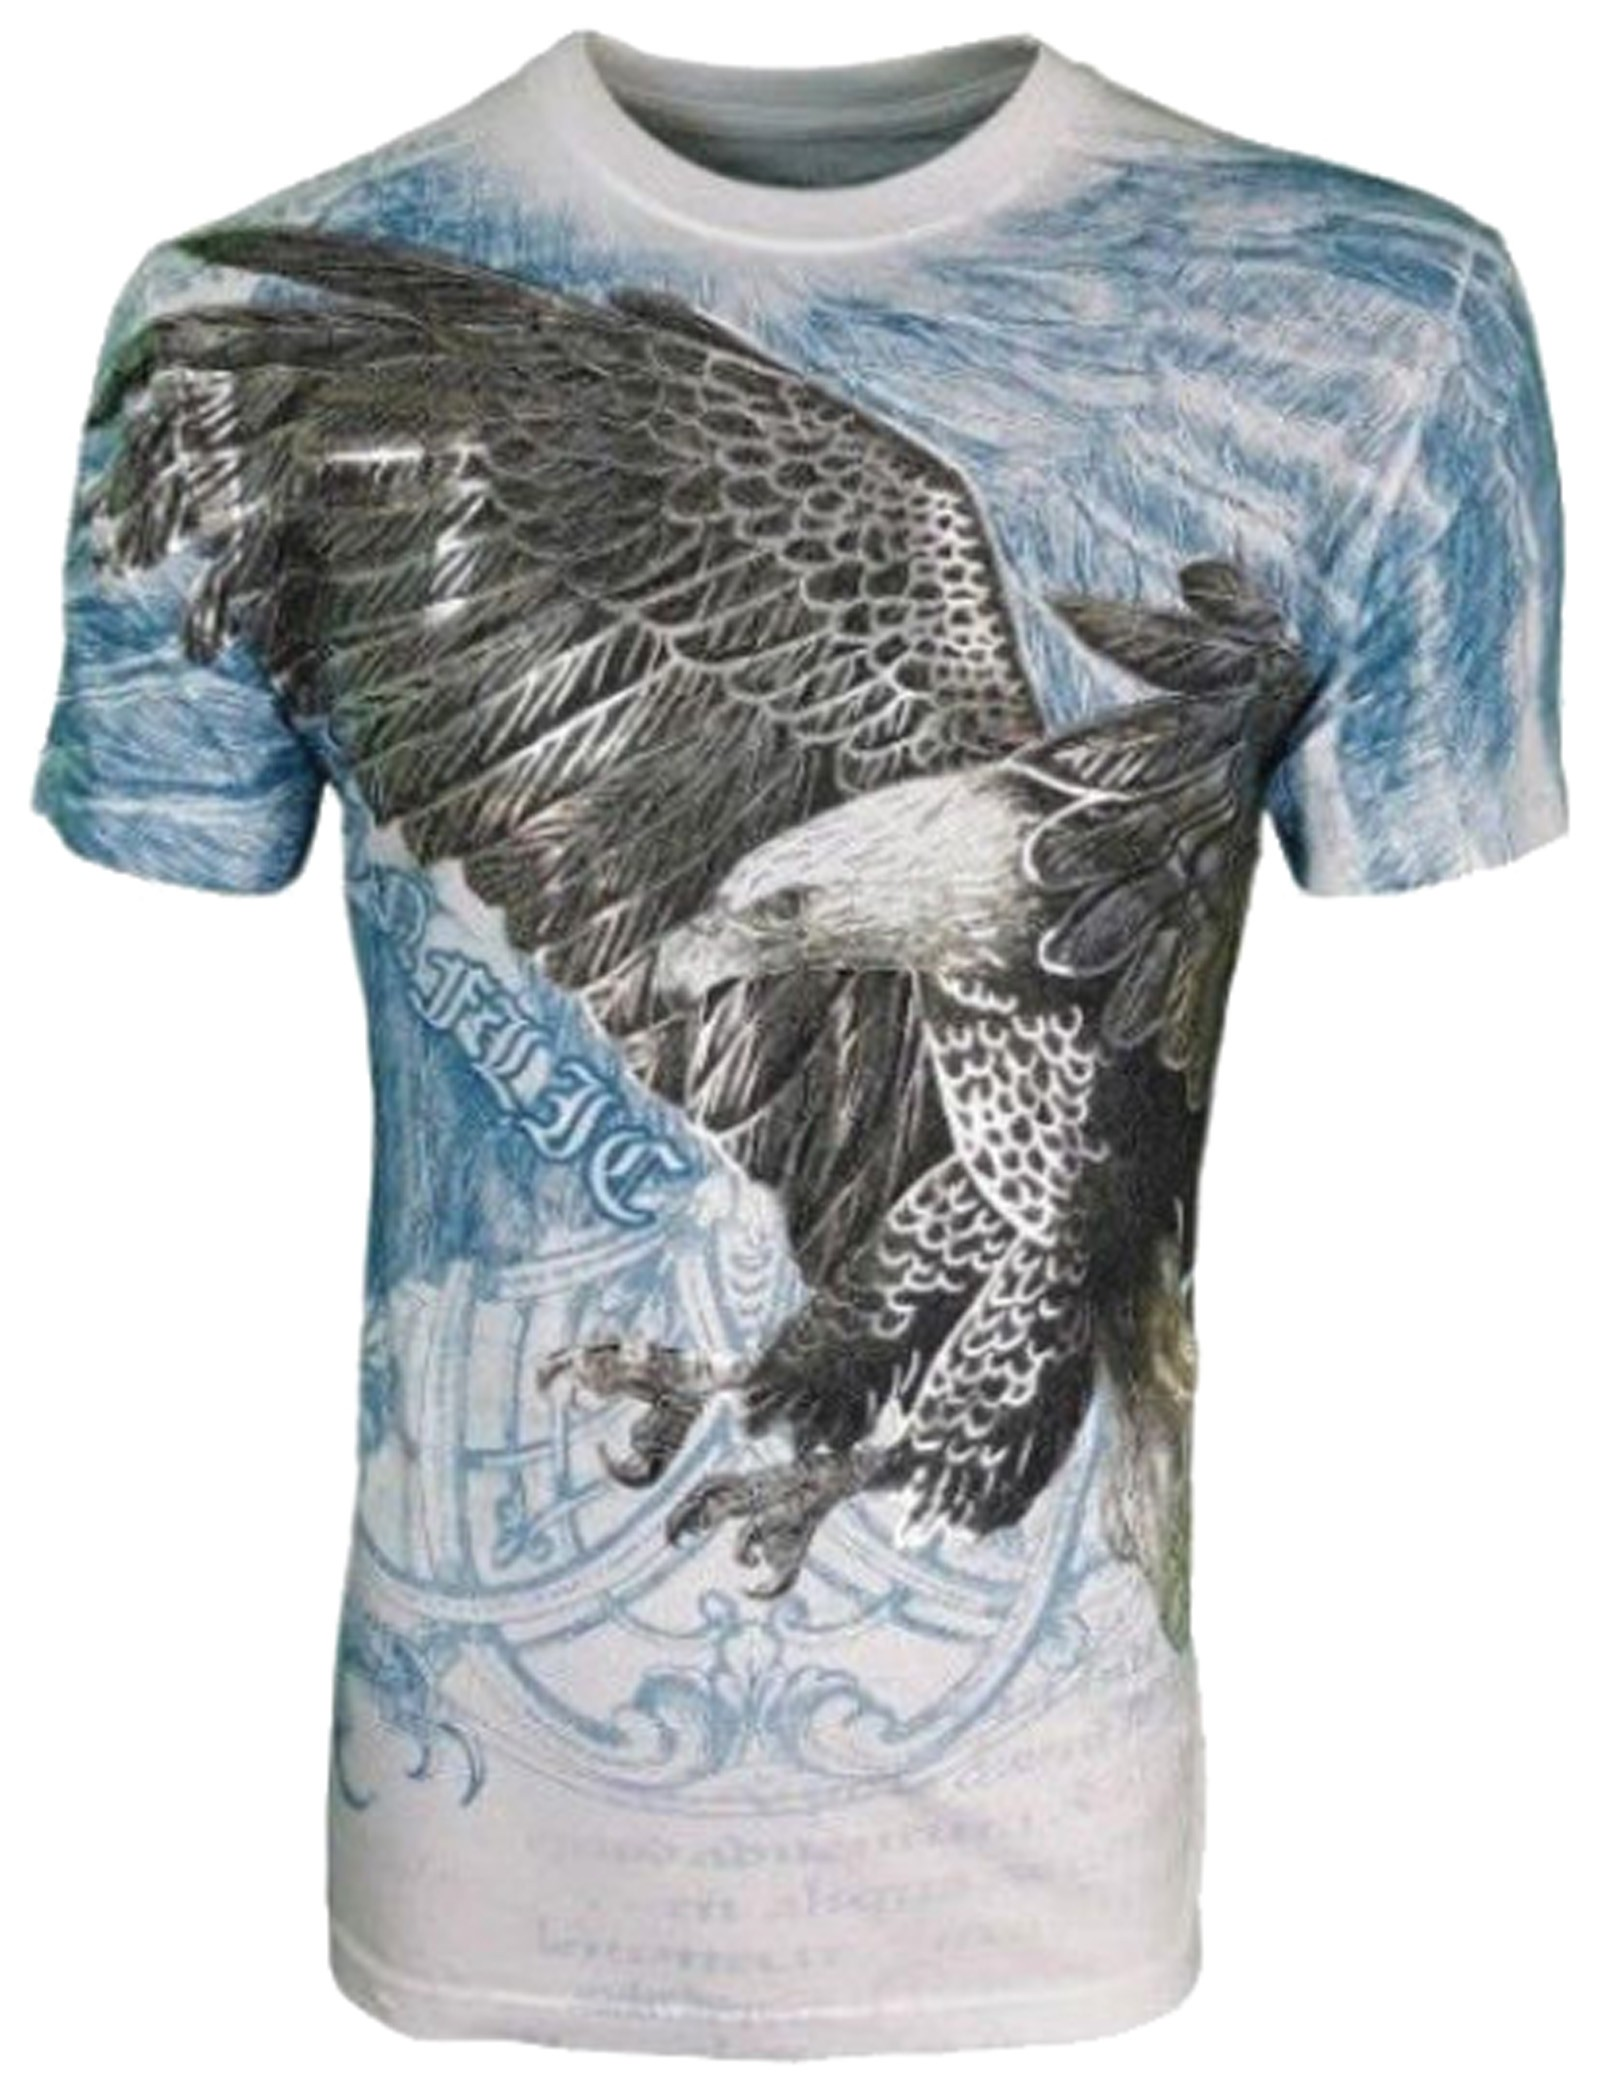 Konflic Clothing - Screaming Eagle T-Shirt